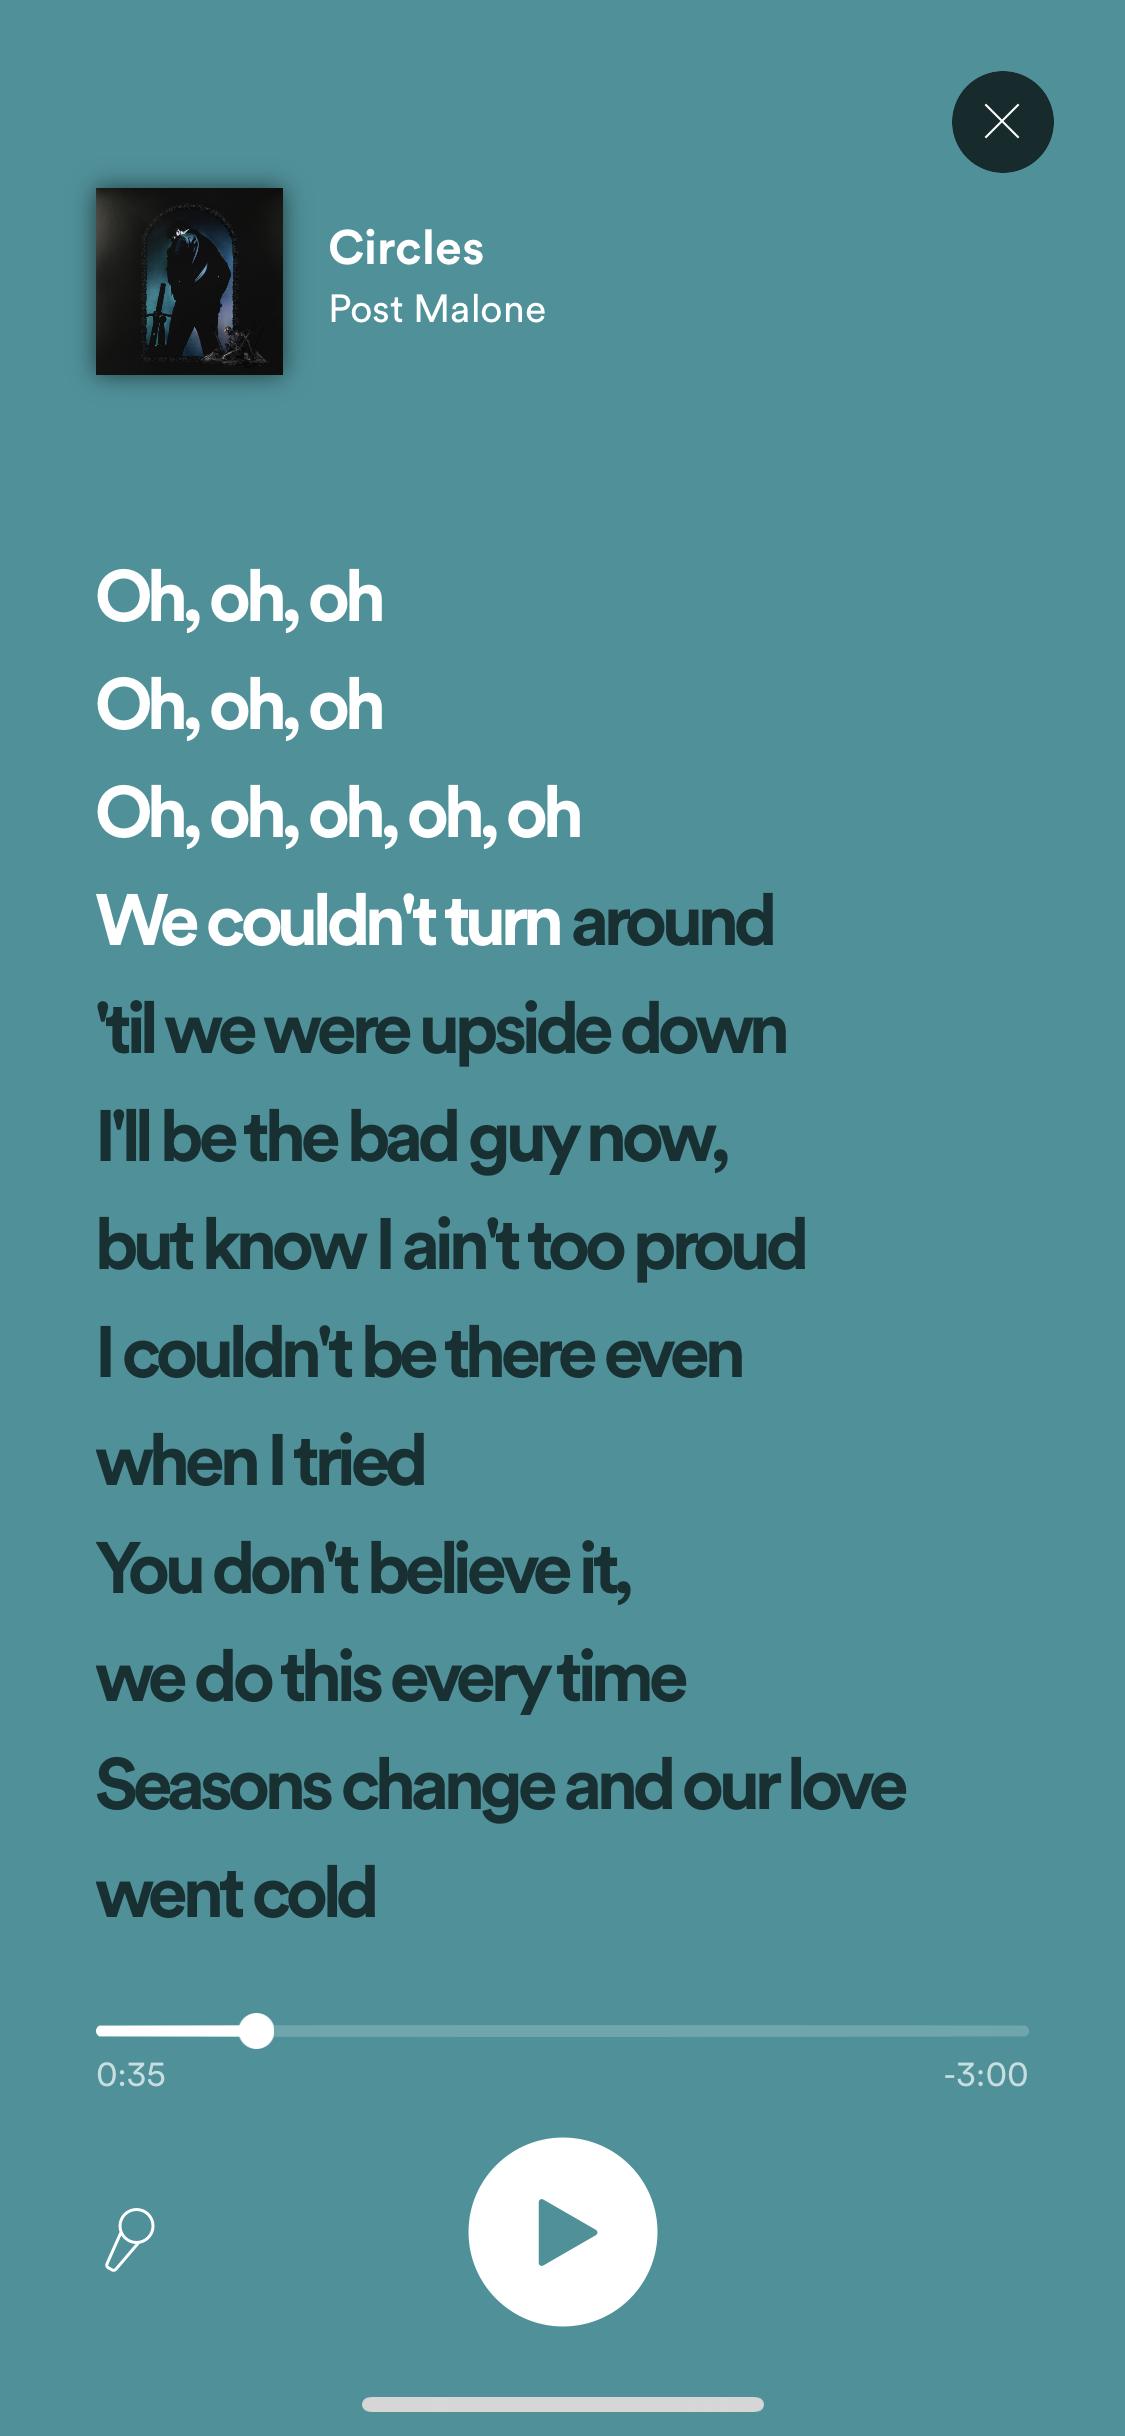 All Platforms] Add time synced lyrics - The Spotify Community